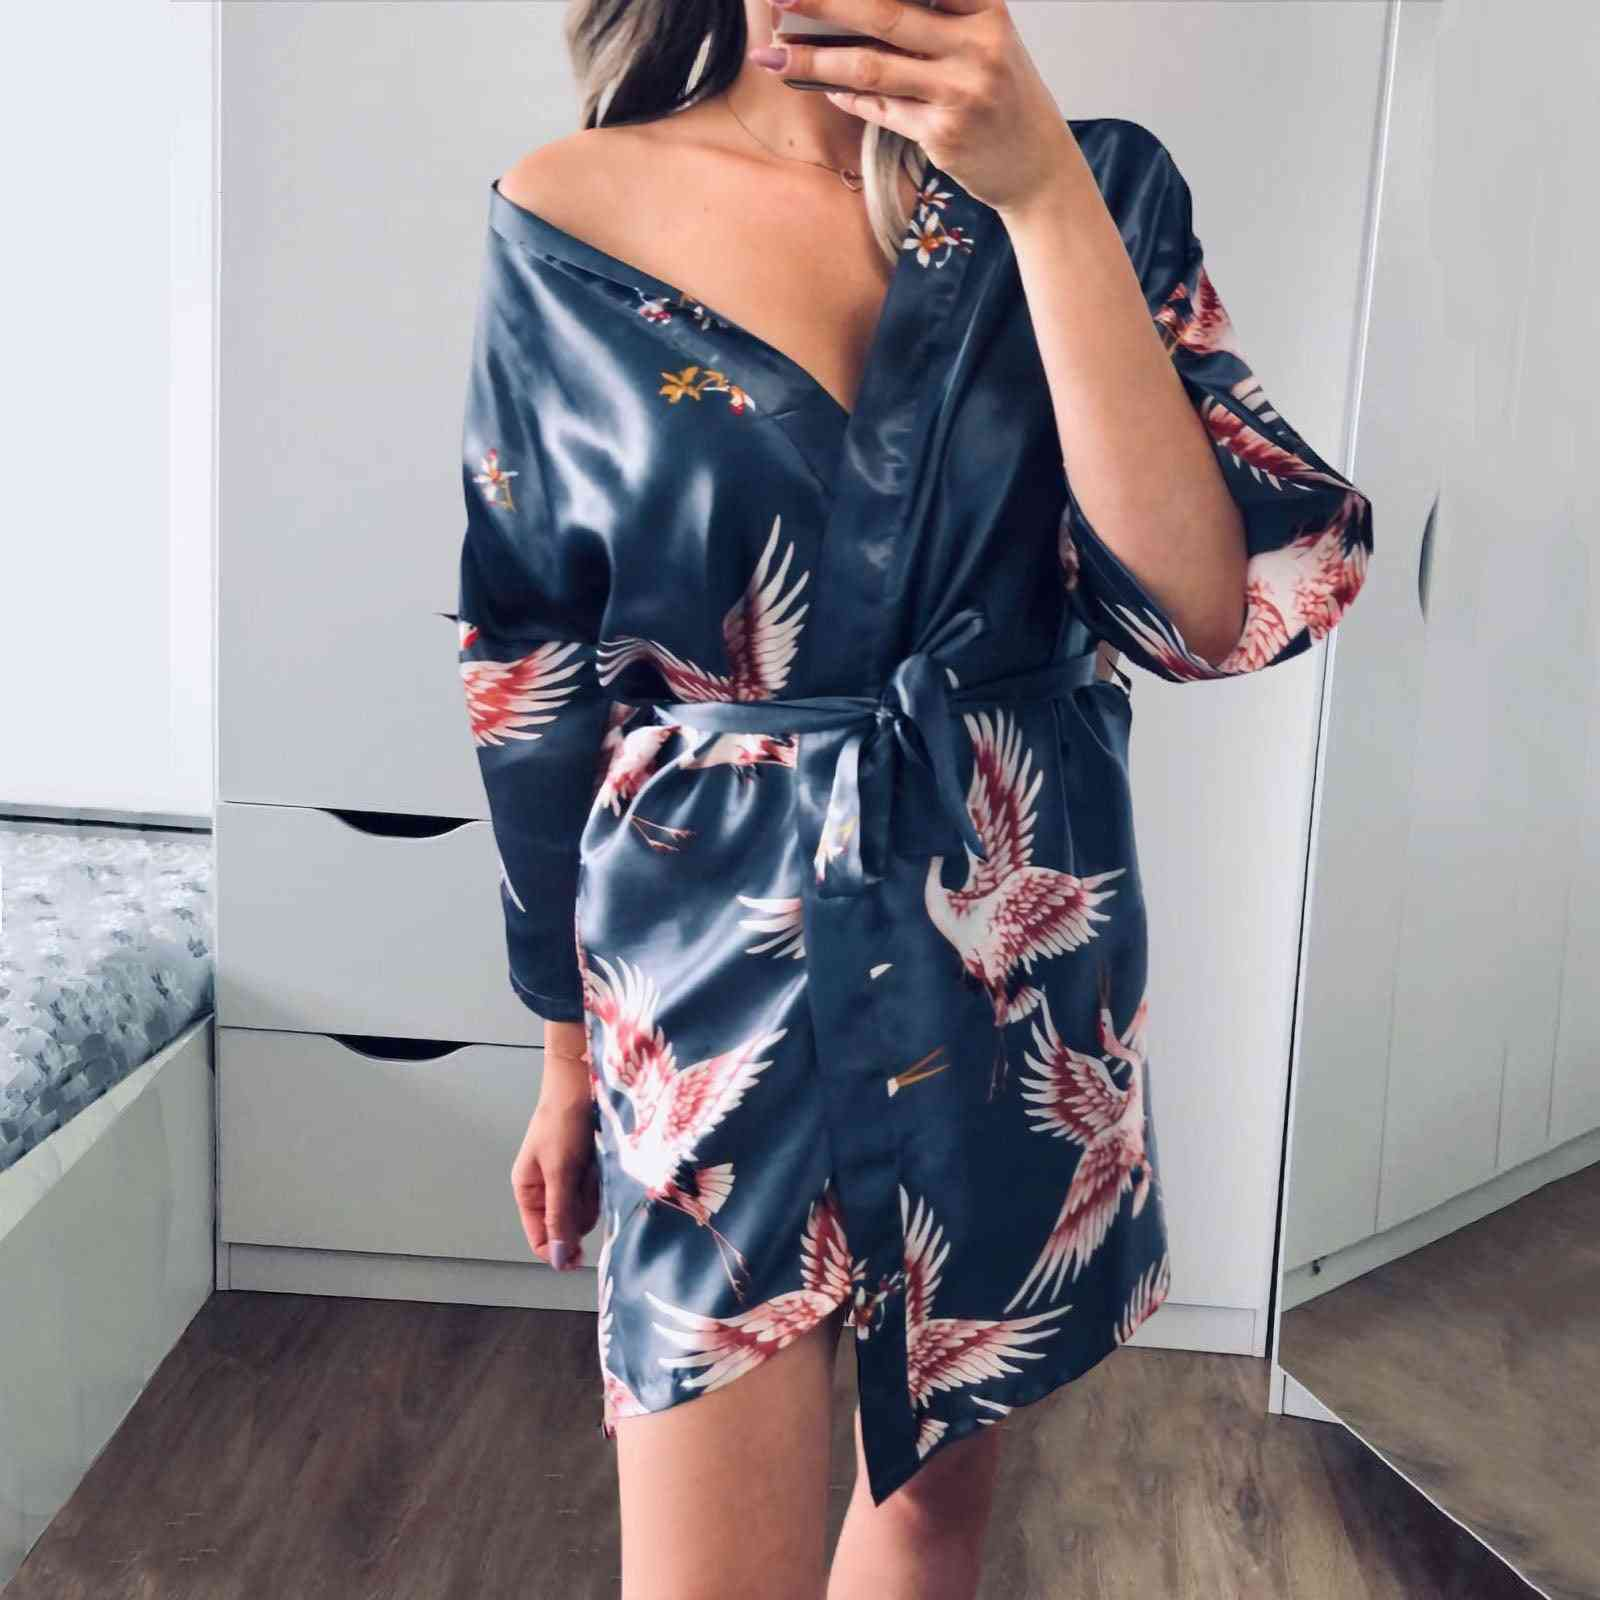 Flower Silk Nightgown, Print Sleeve Pajamas Bathrobe Dressing Sleepwear